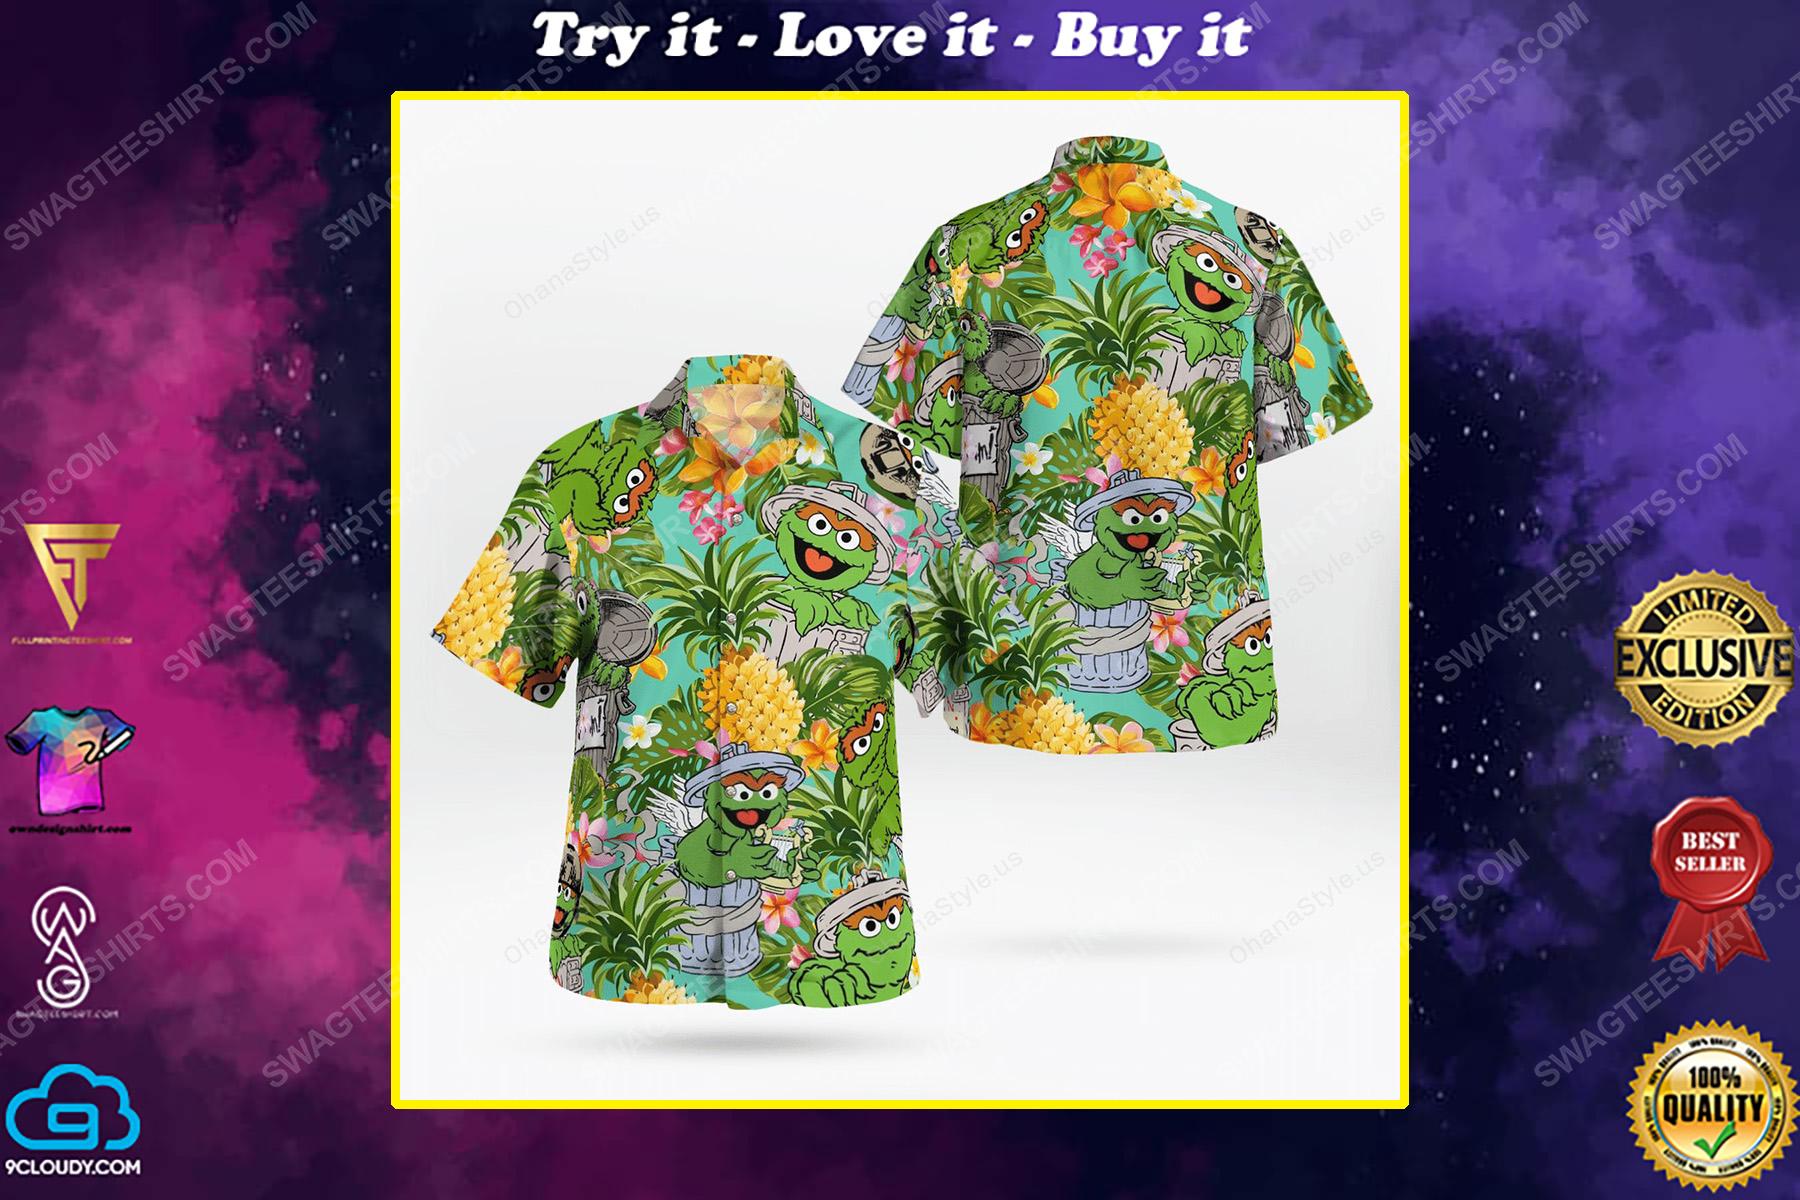 The muppet show oscar the grouch hawaiian shirt